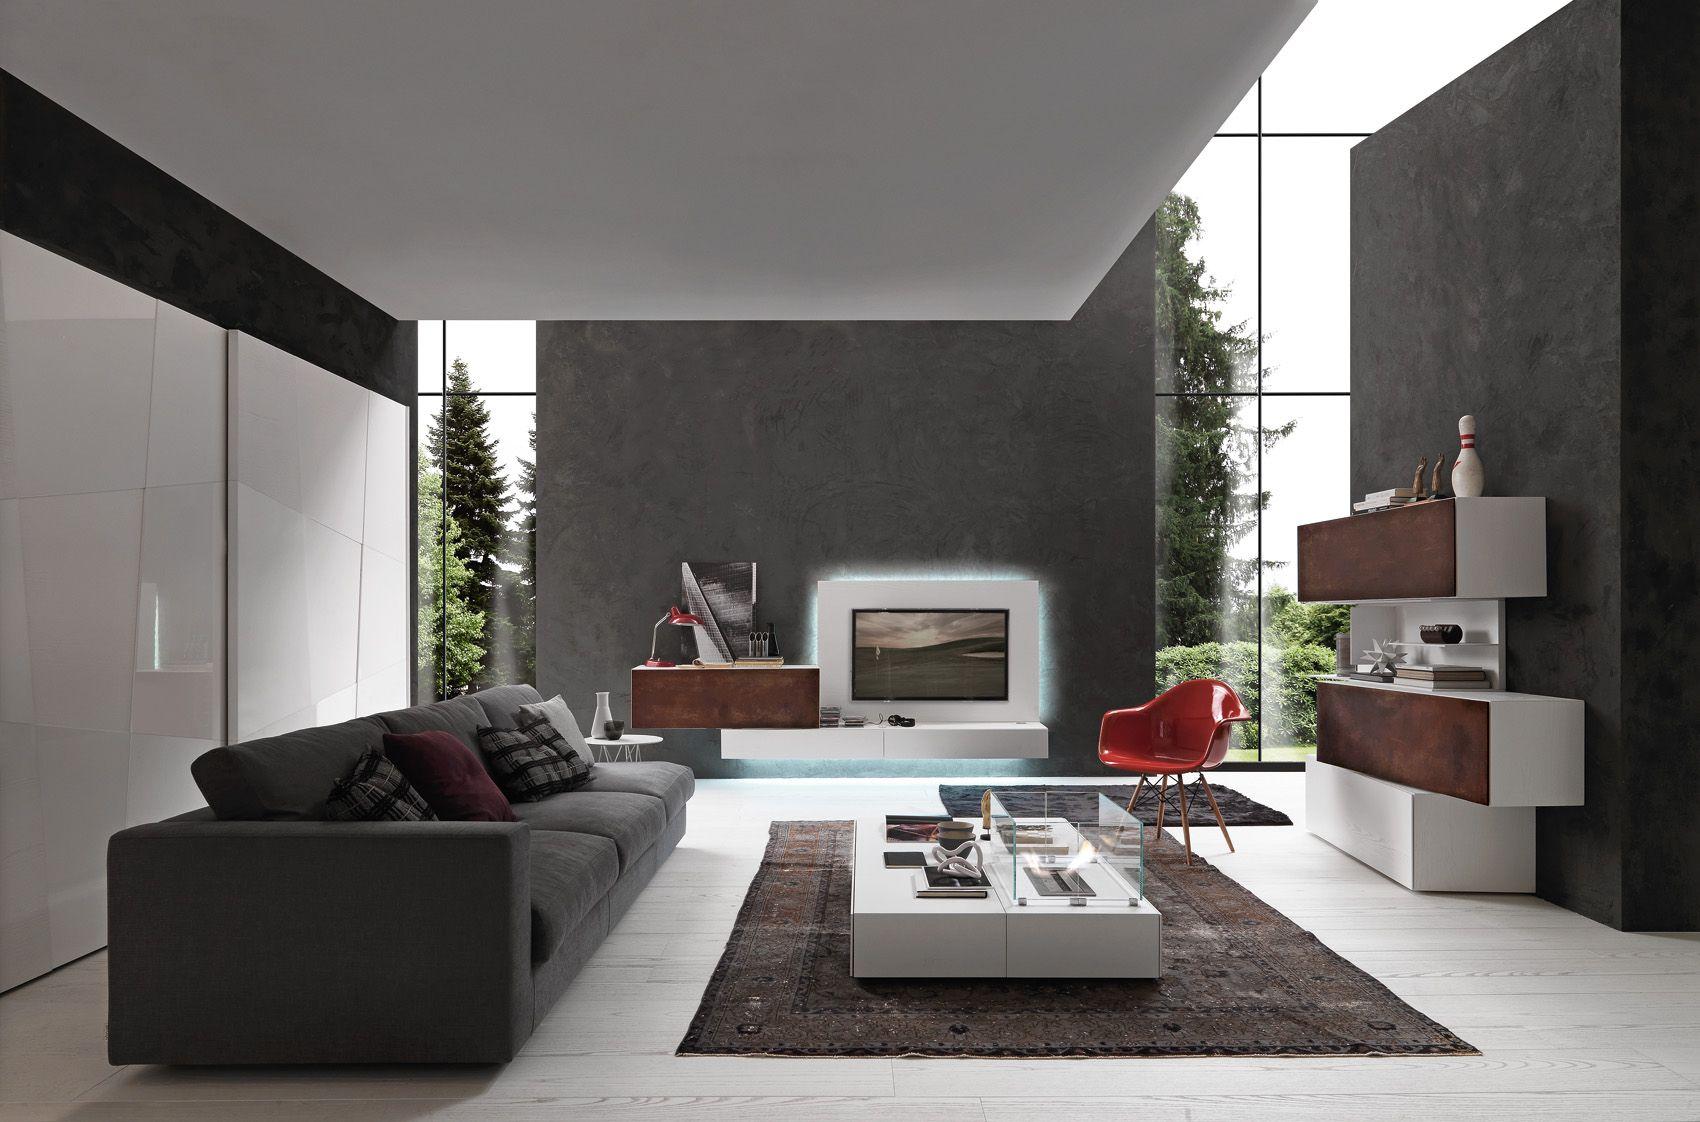 Bianco candido color wood base unit and tv panel wall for Mobili italiani design